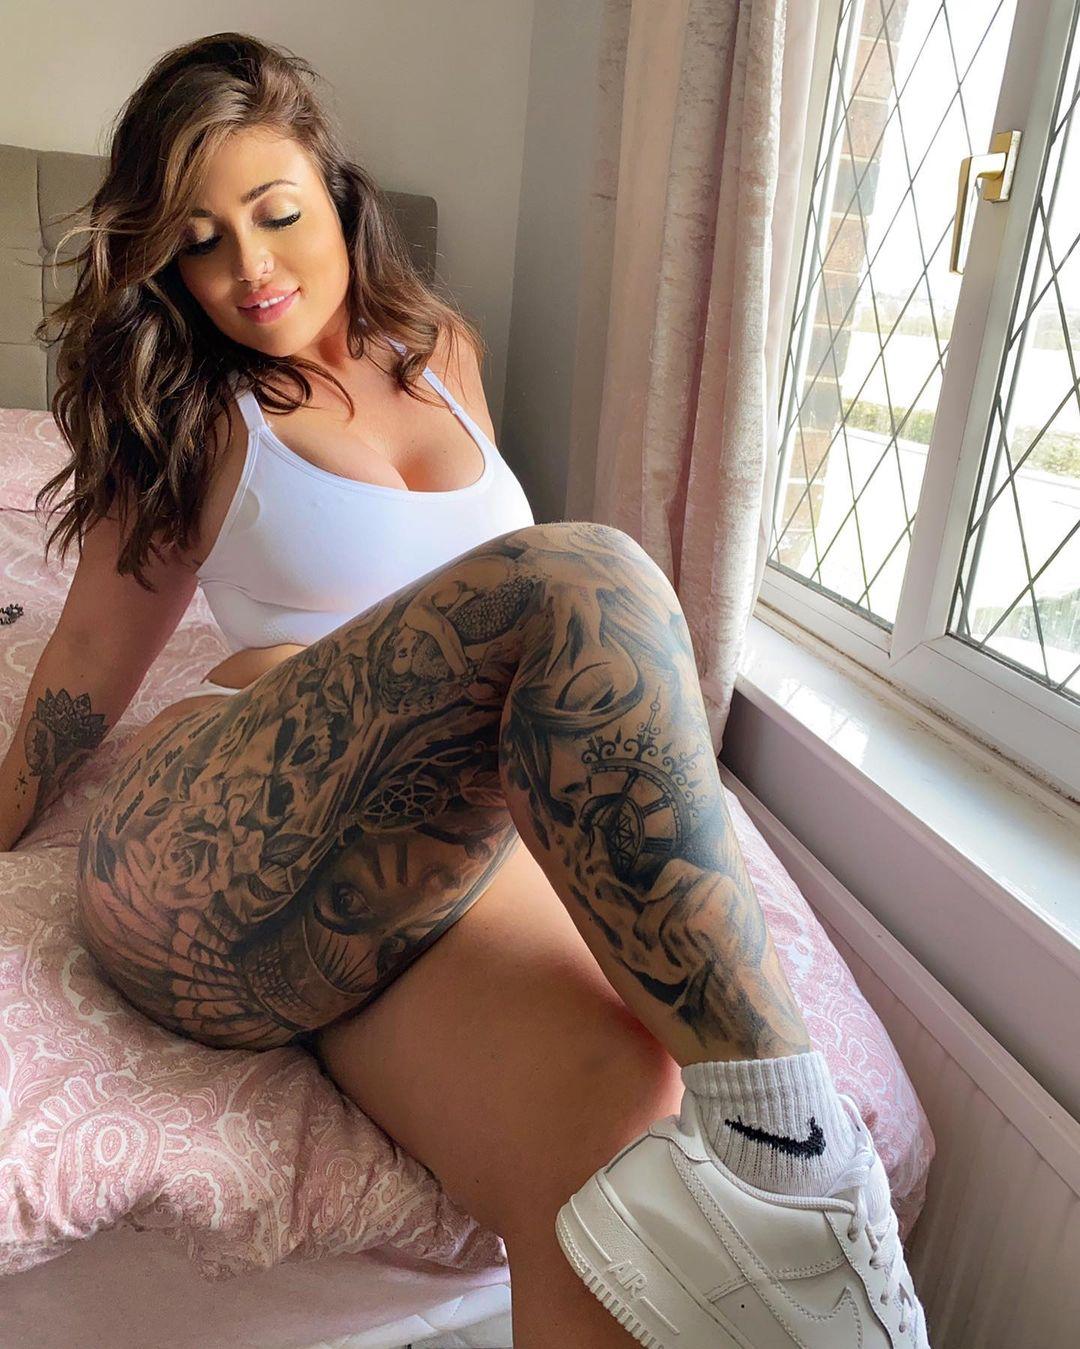 Hannah Jane (Ханна Джейн) - попастая британка с татуировками (22 фото) 4